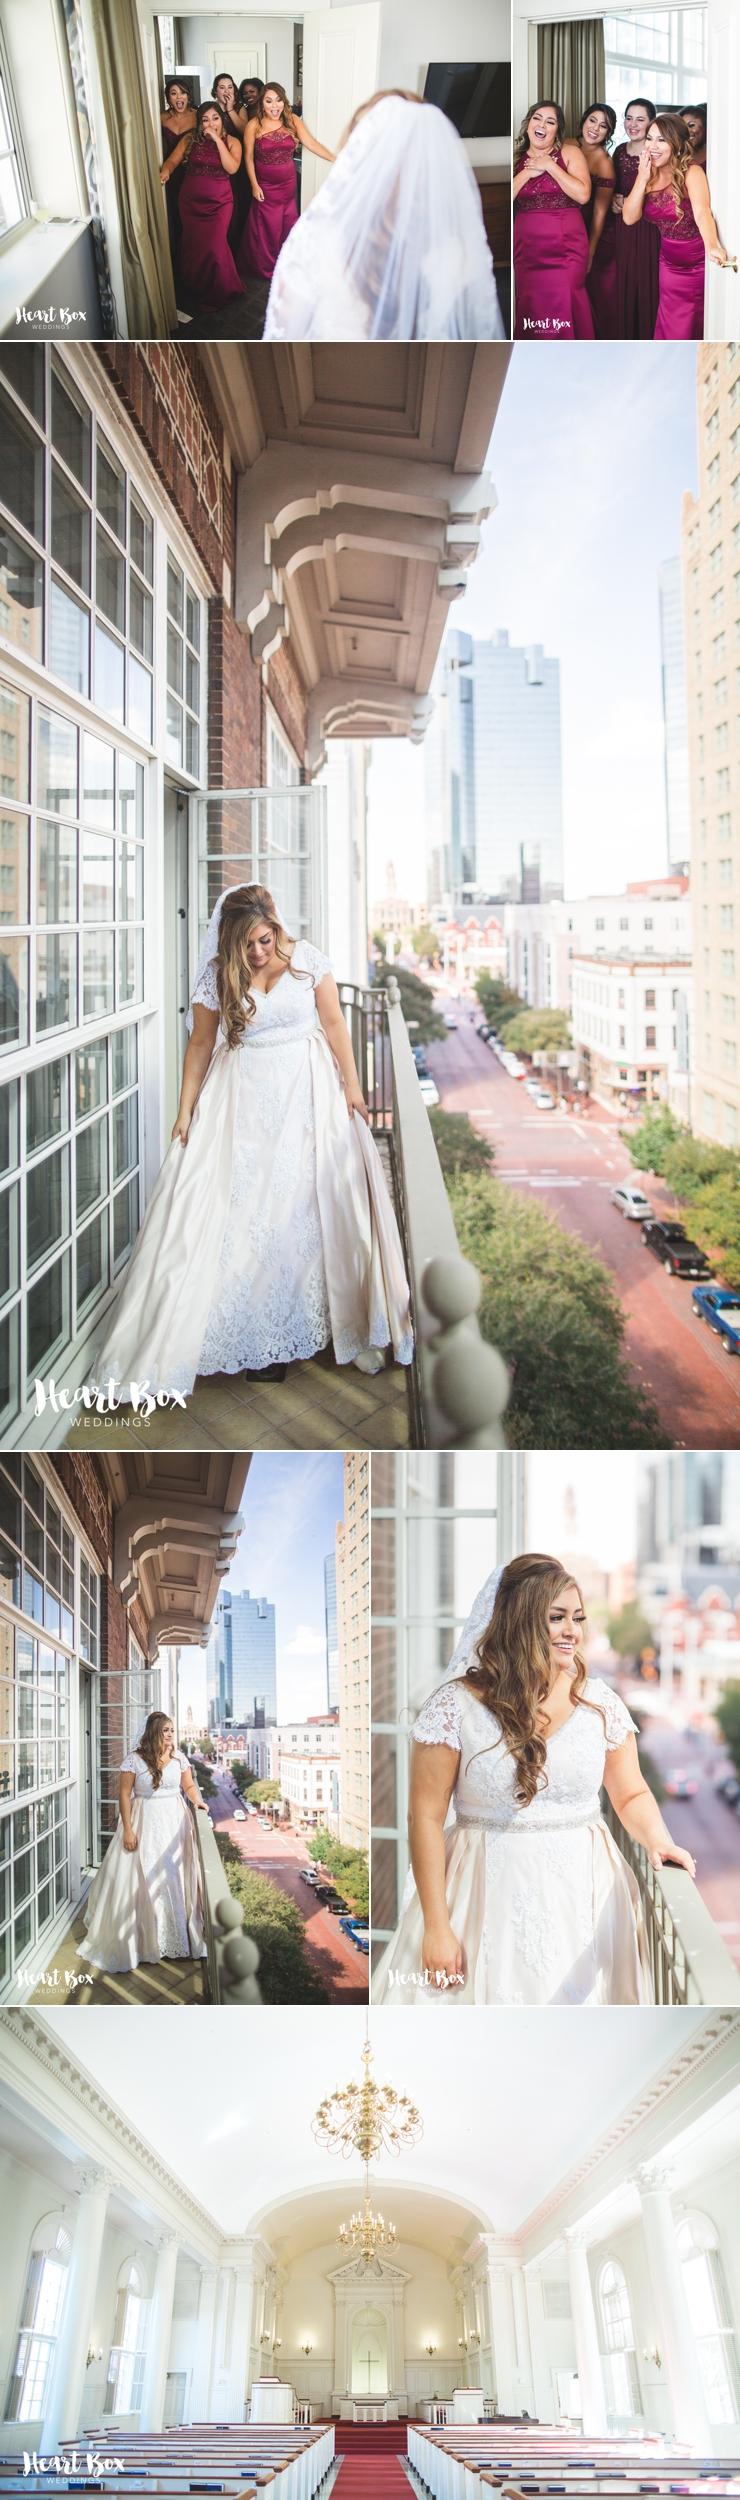 Montero Wedding BC 3.jpg